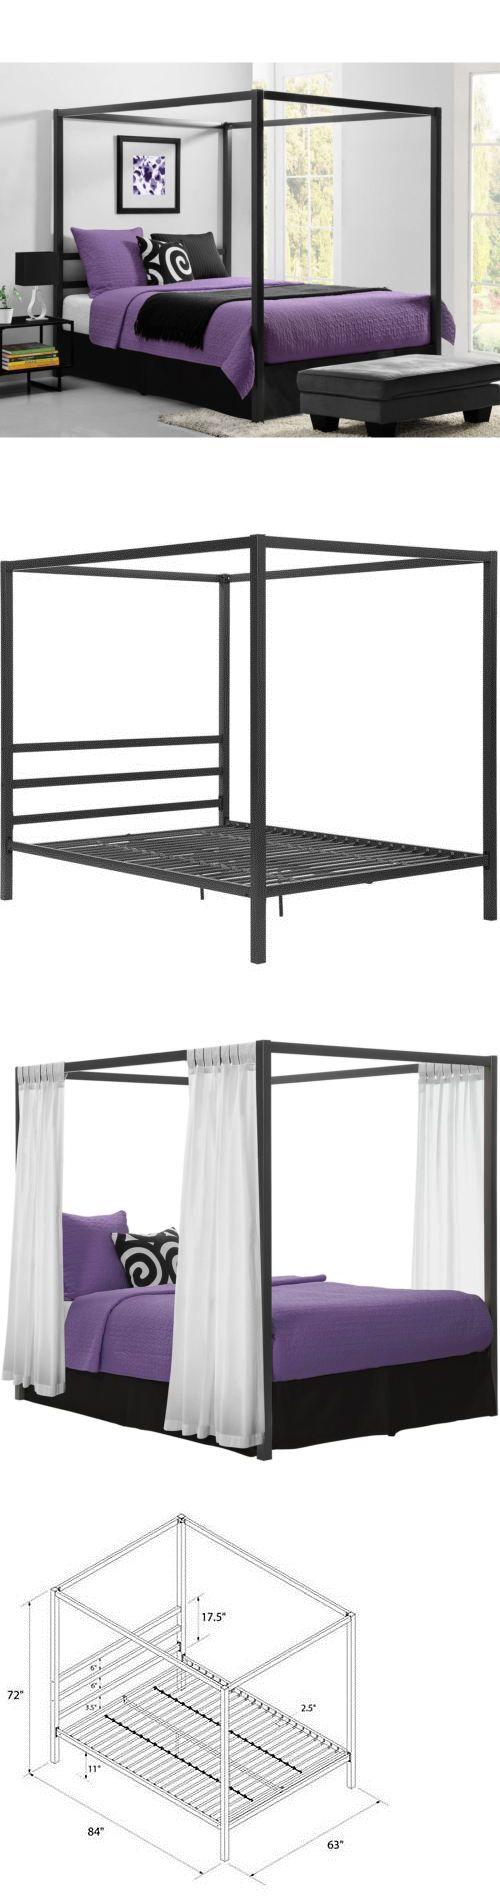 Baby jasper bed brackets - Canopies And Netting 48090 Queen Canopy Metal Bed Frame Modern Industrial Framed Headboard Platform Gray